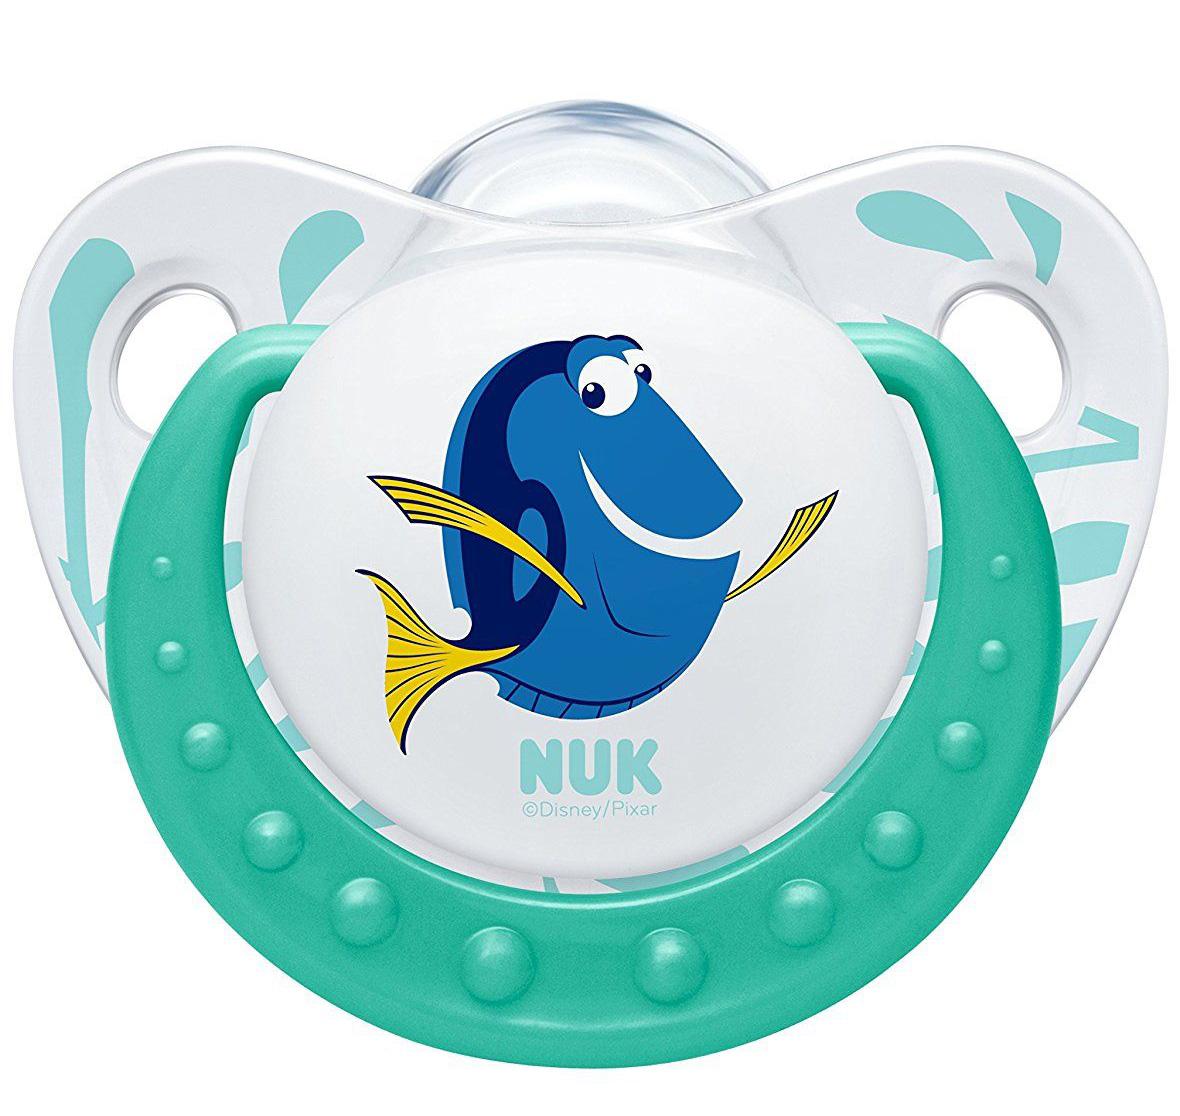 Nuk Trendline Finding Dory Πιπίλα Σιλικόνης με Κρίκο Χωρίς BPA Πράσινο – Μέγεθος 1 (0-6 μηνών)